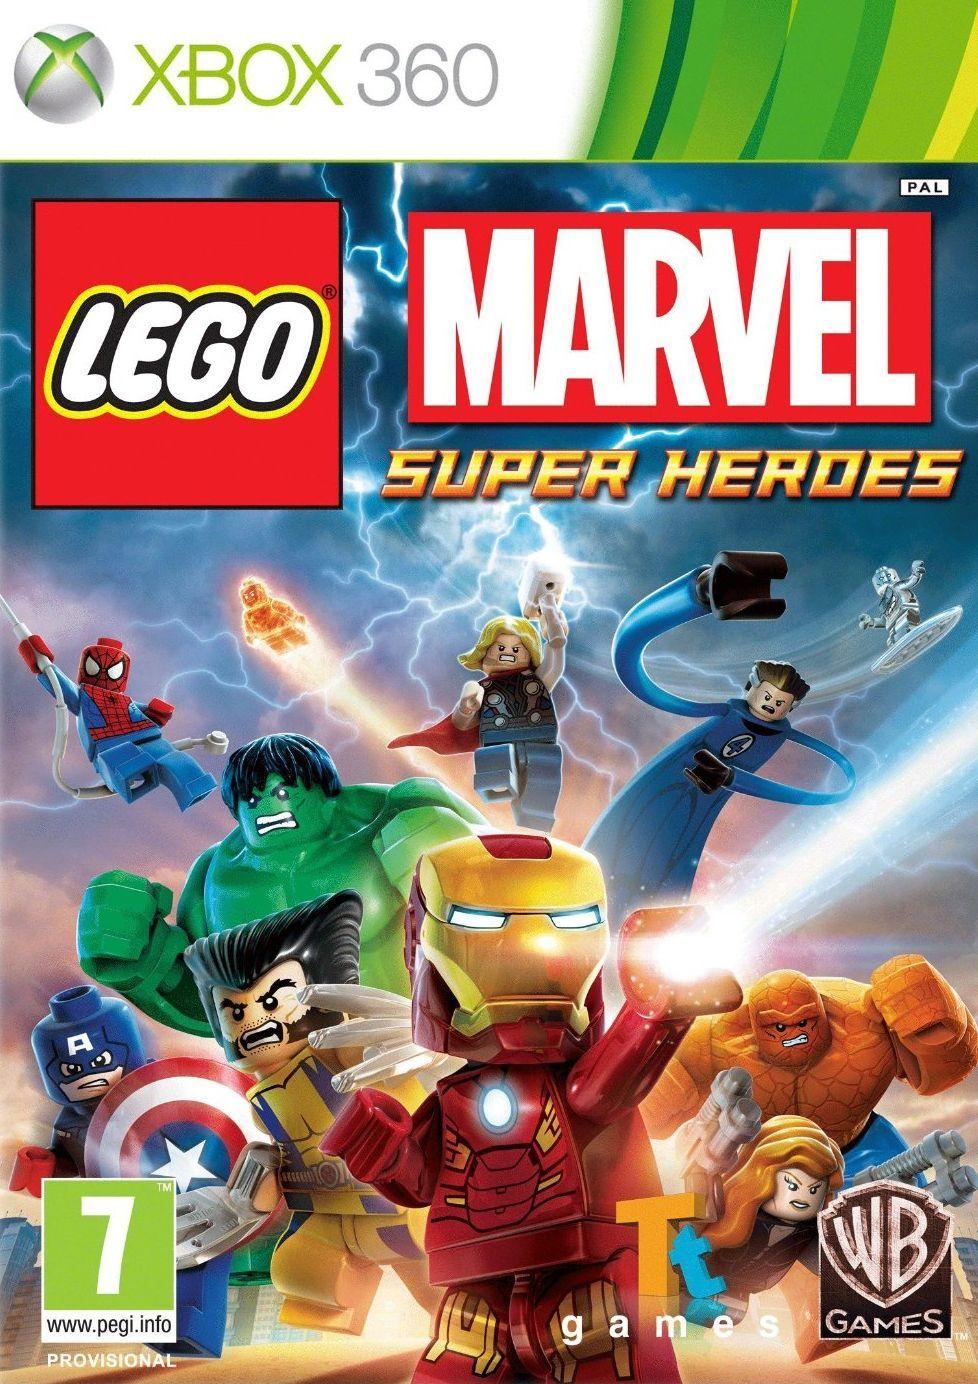 LEGO Marvel Super Heroes (Xbox 360) - 1